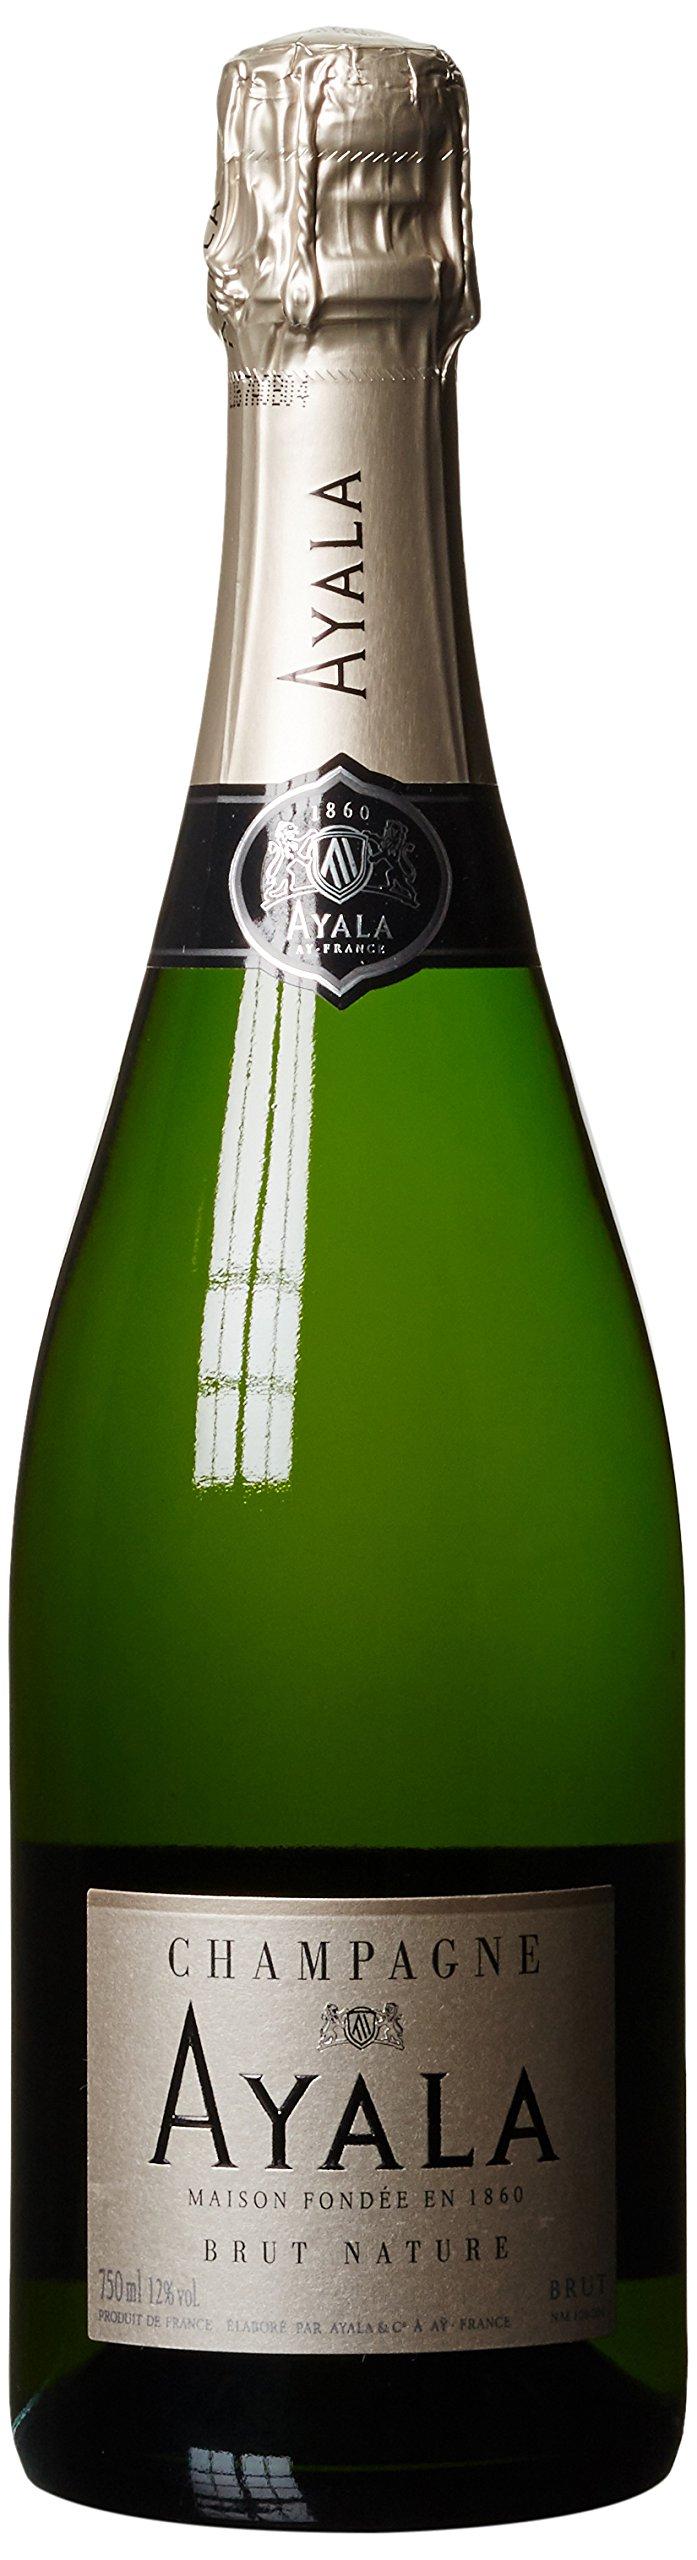 Ayala-Brut-Nature-Champagner-1-x-075-l